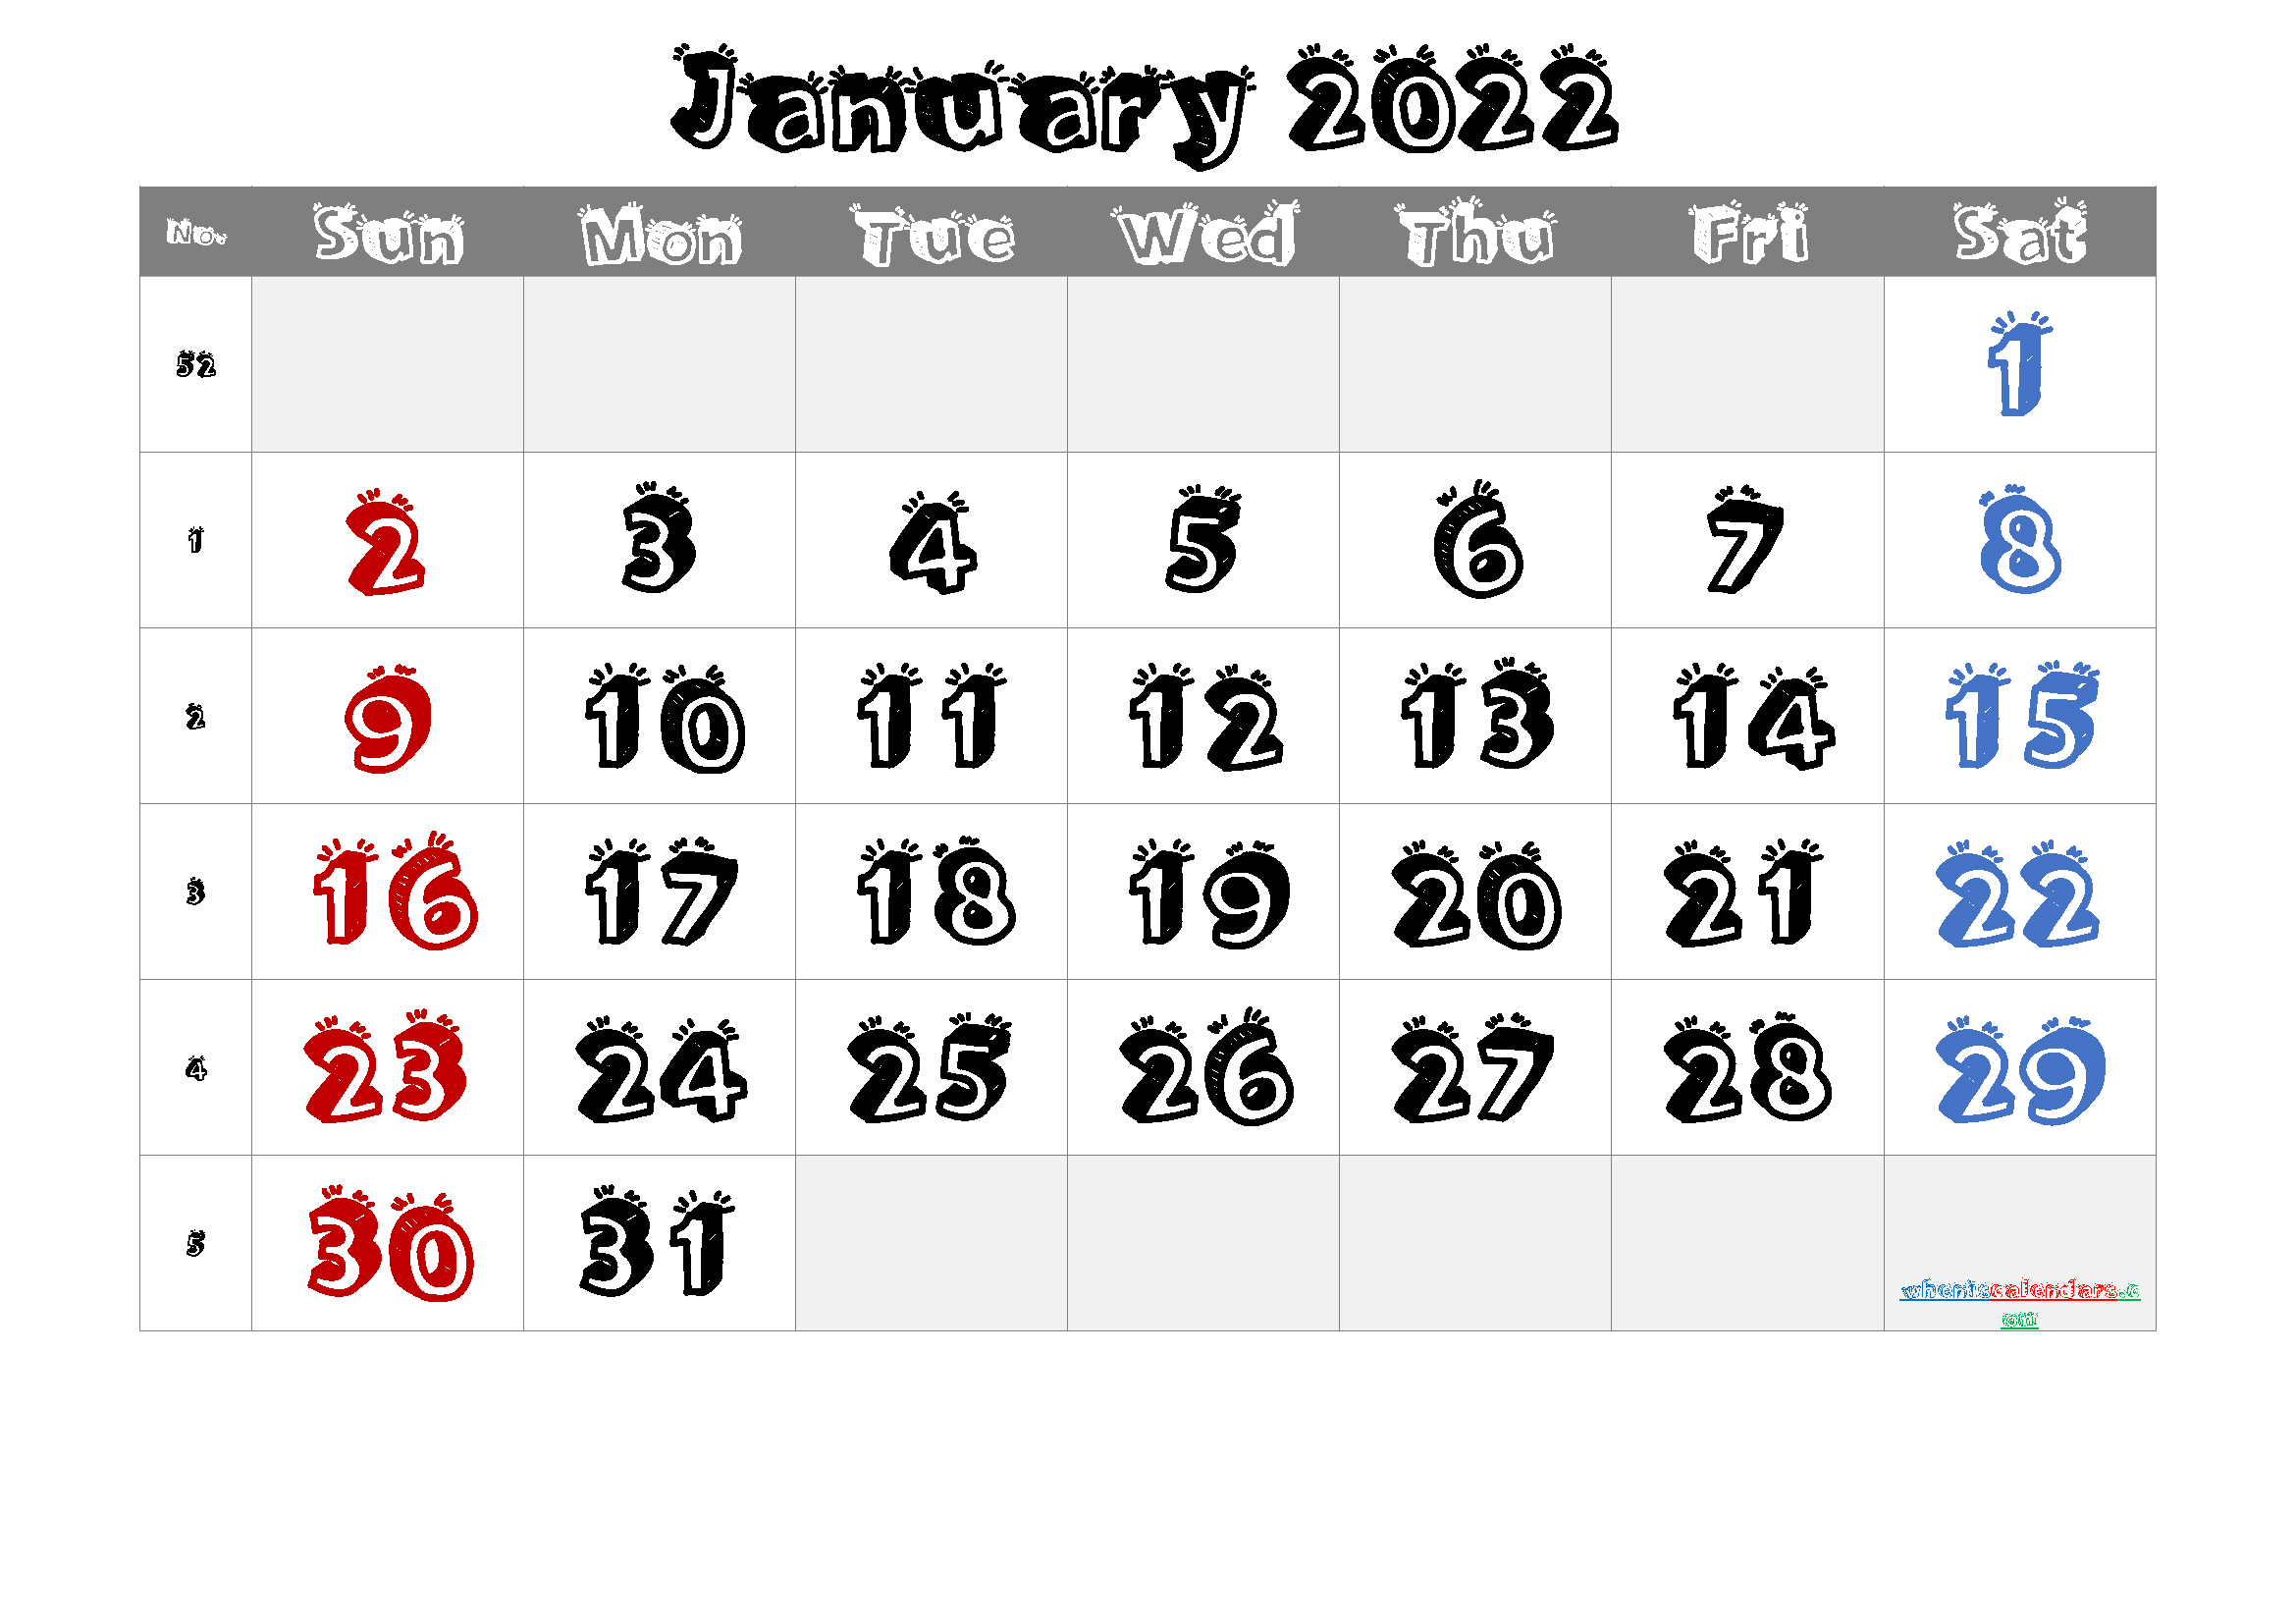 January 2022 Printable Calendar